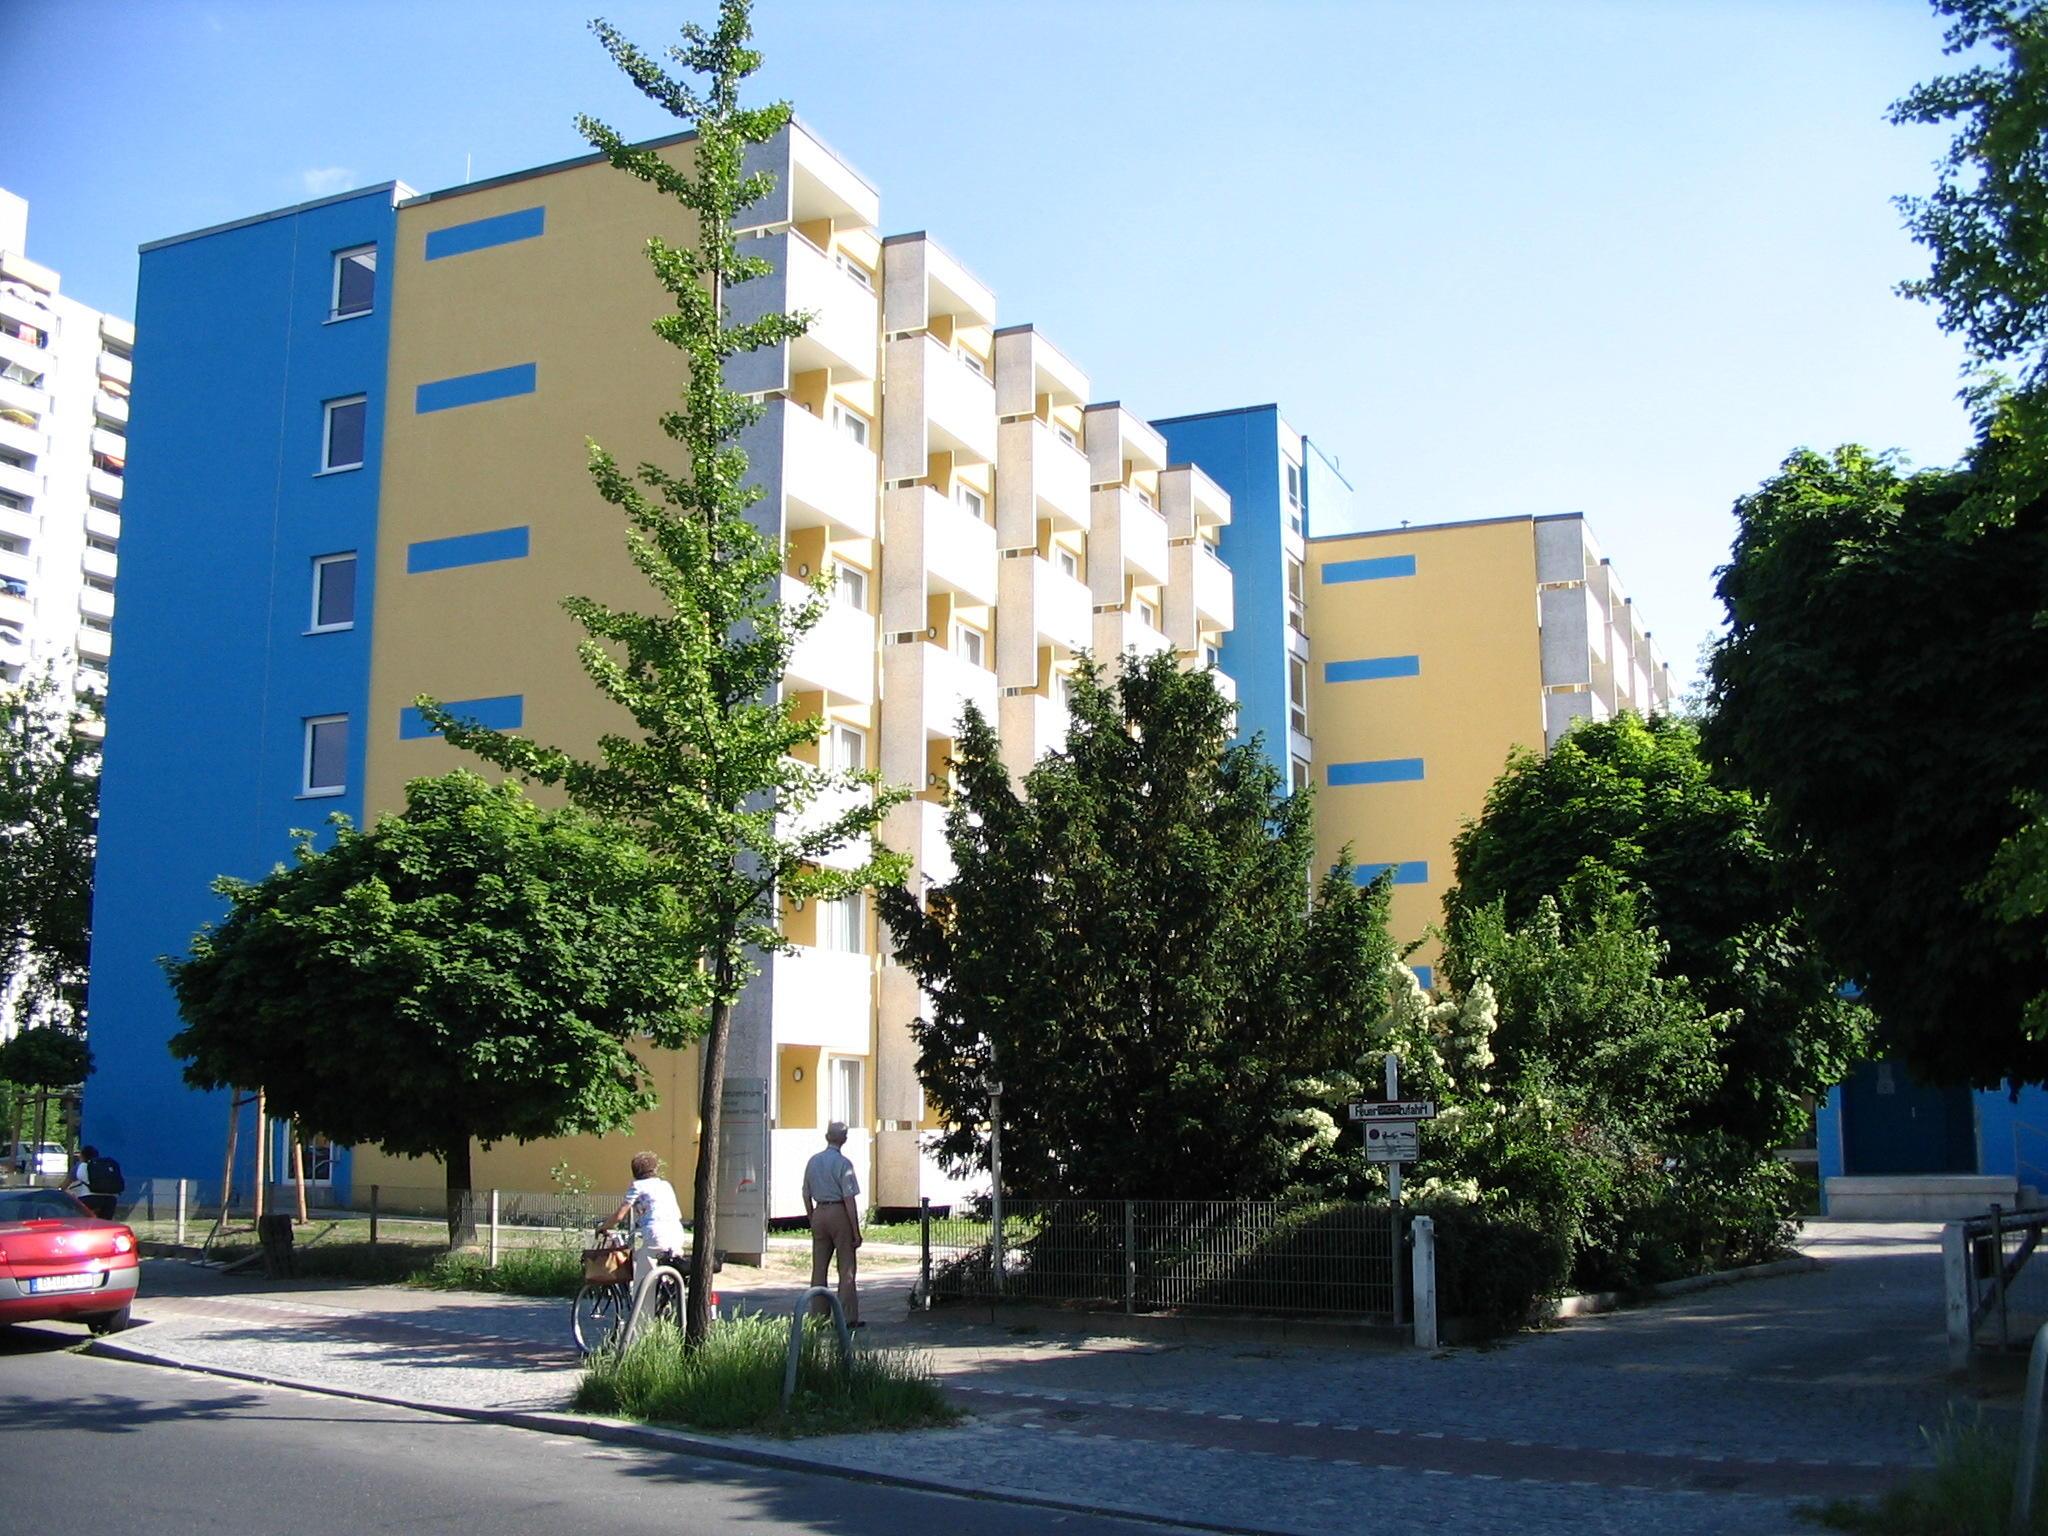 Senioren-Residenz Hildburghauser Straße